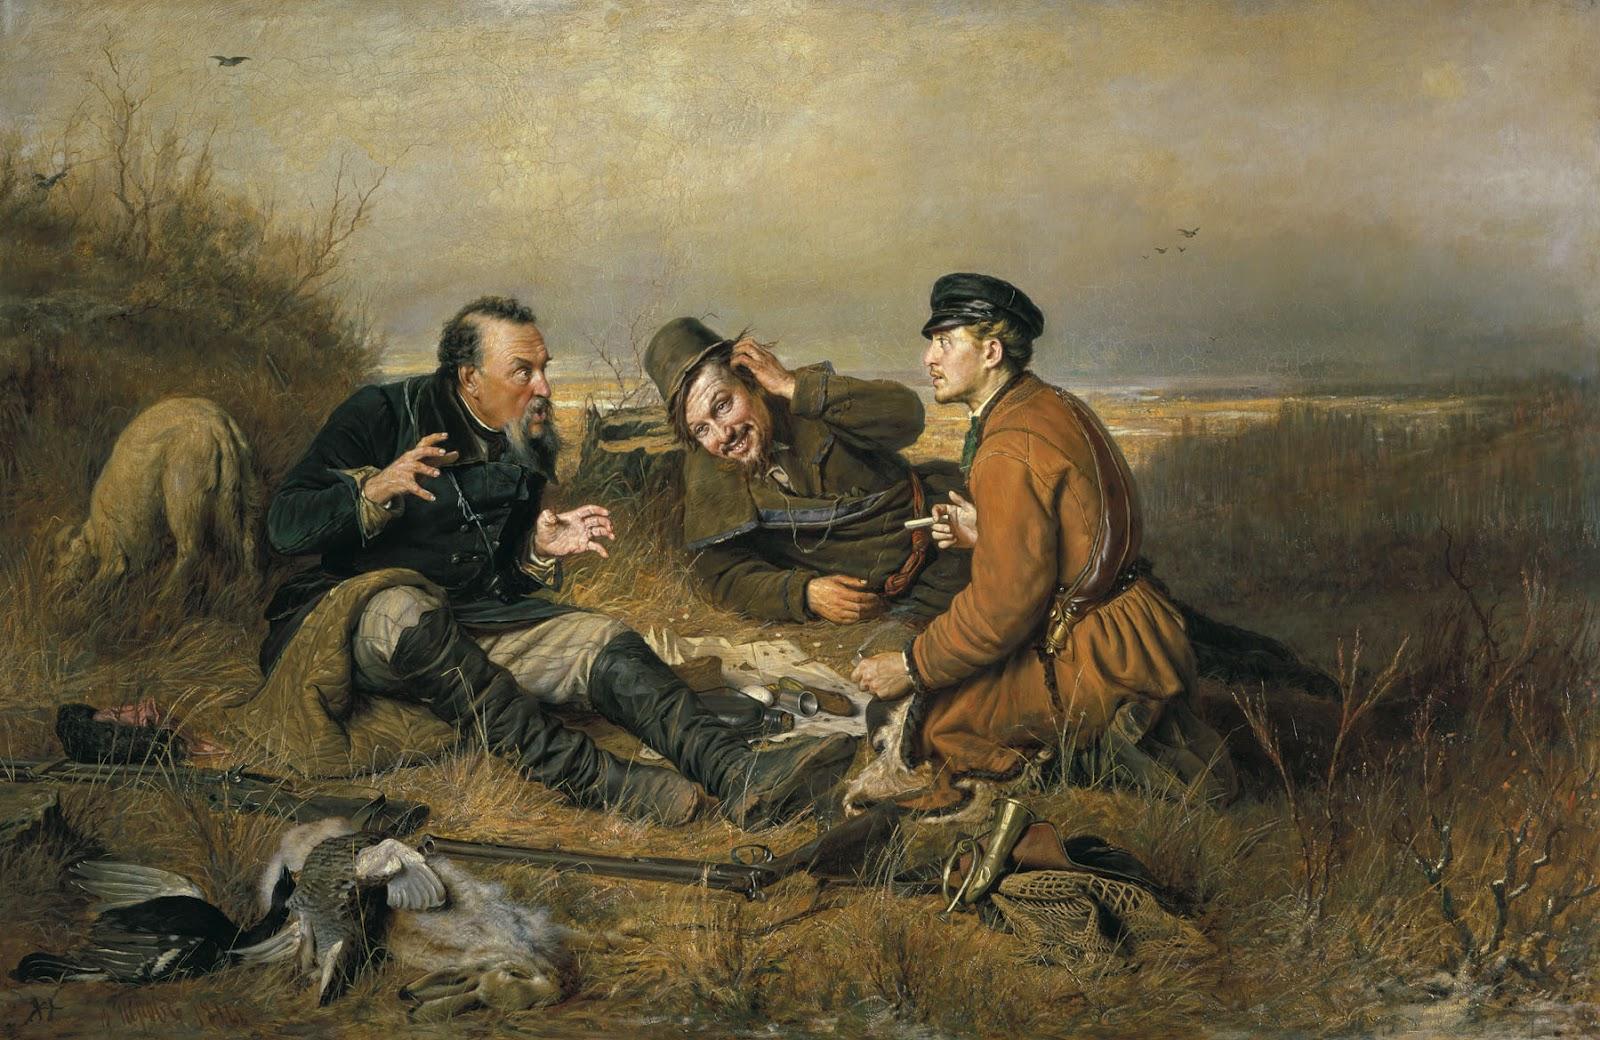 Vasily Perov - Hunters Resting